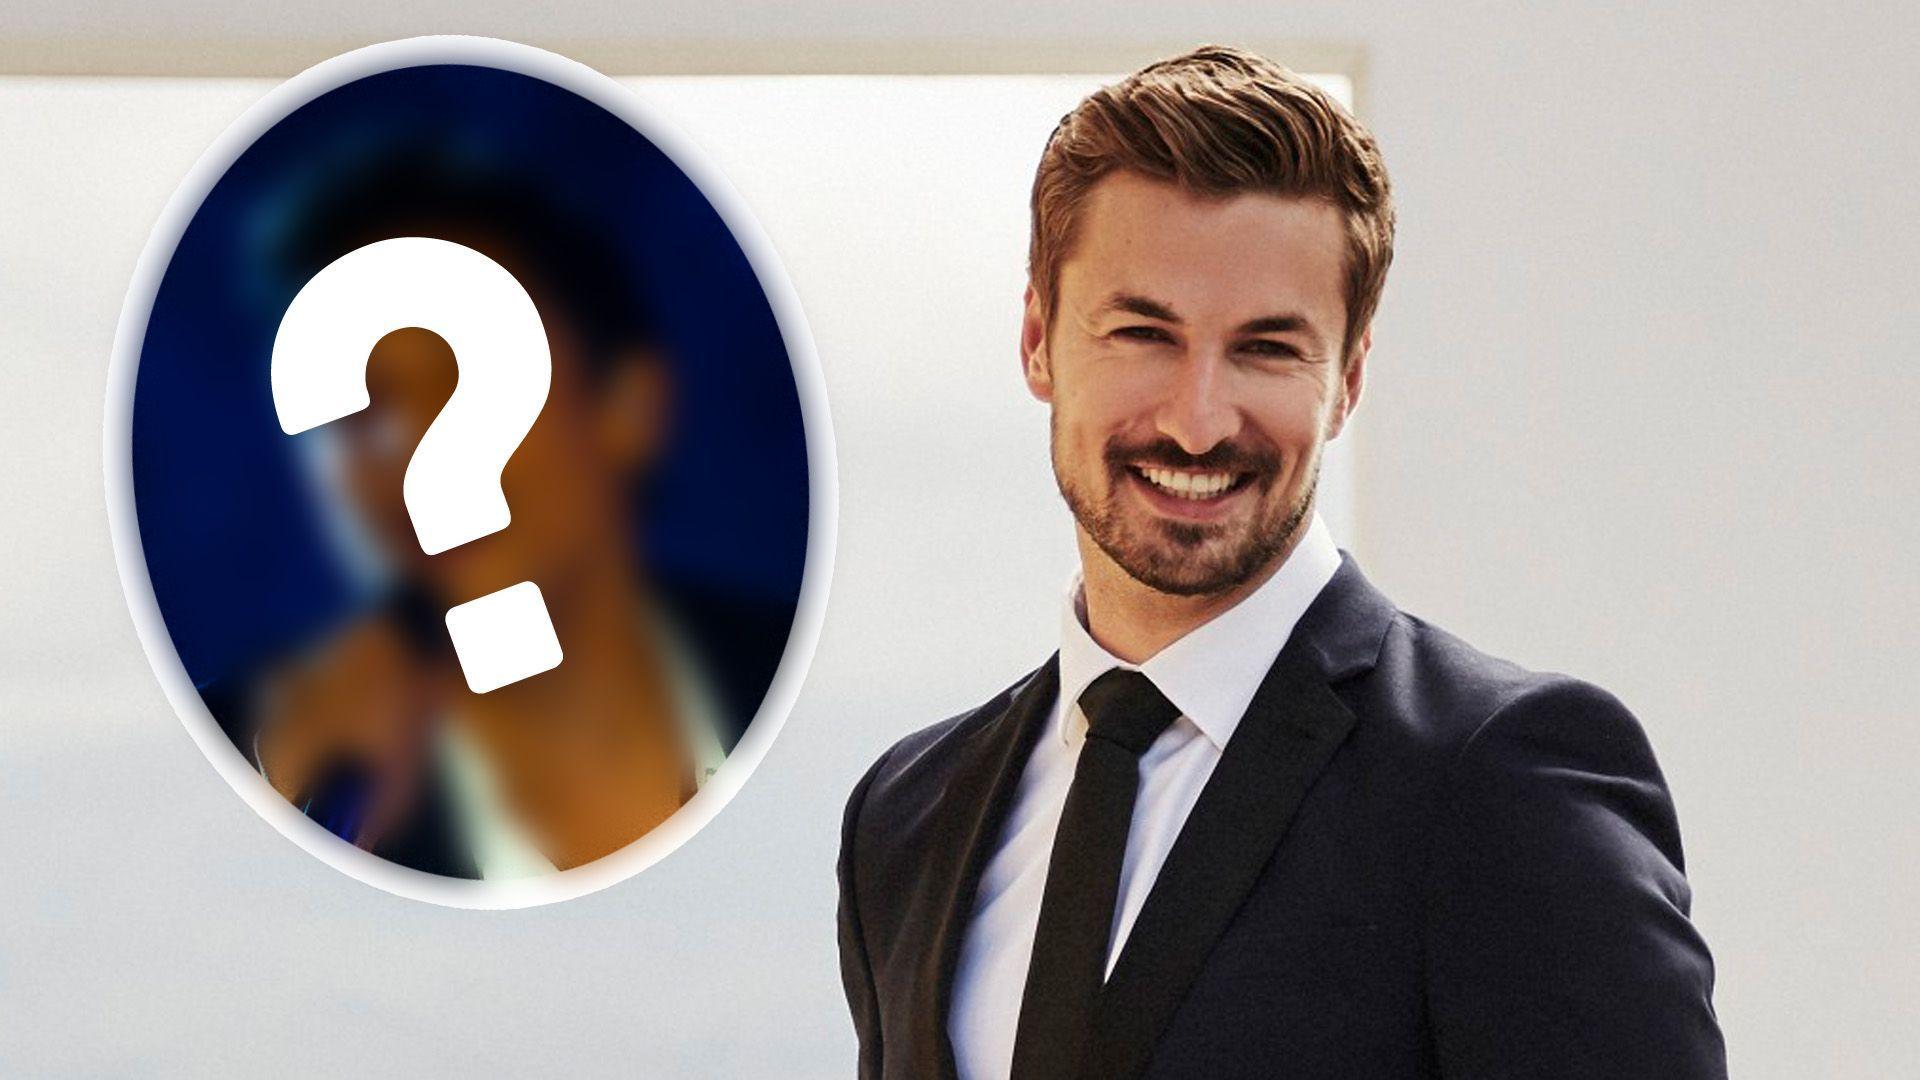 'Prince Charming': DSDS-Kandidat bei schwuler Kuppelshow dabei